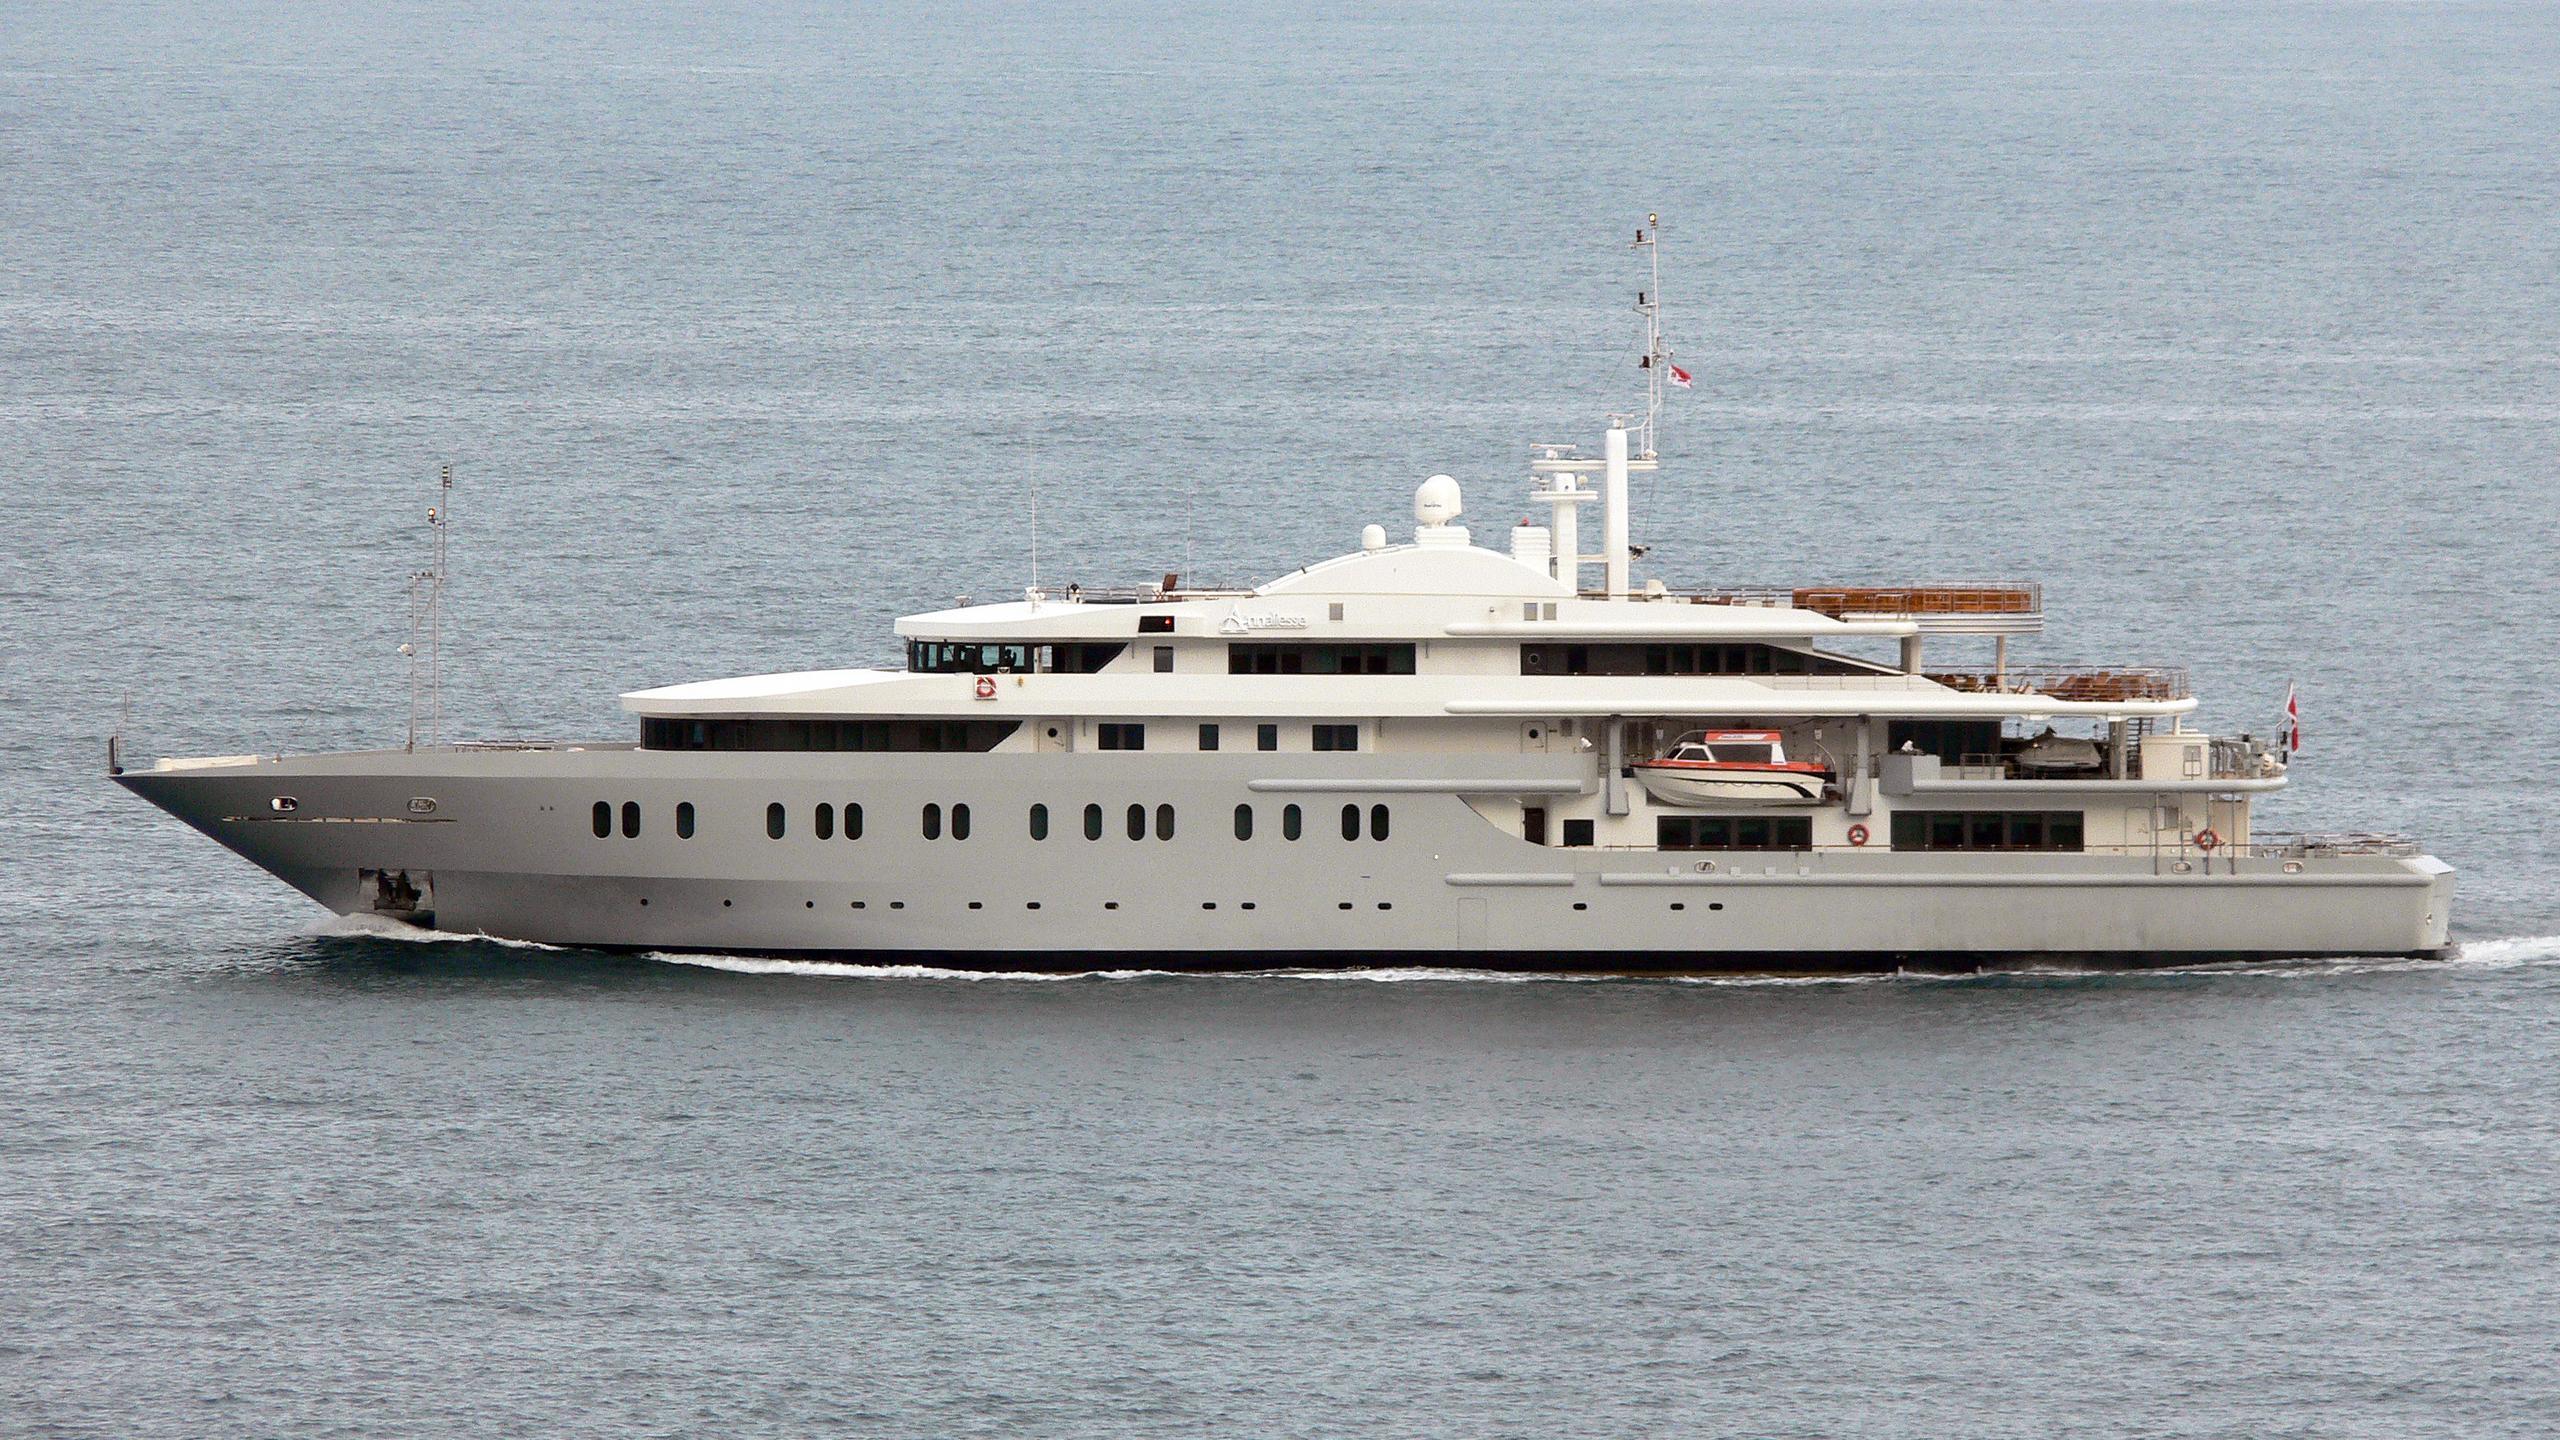 queen-miri-motor-yacht-neorion-2004-91m-profile-before-refit